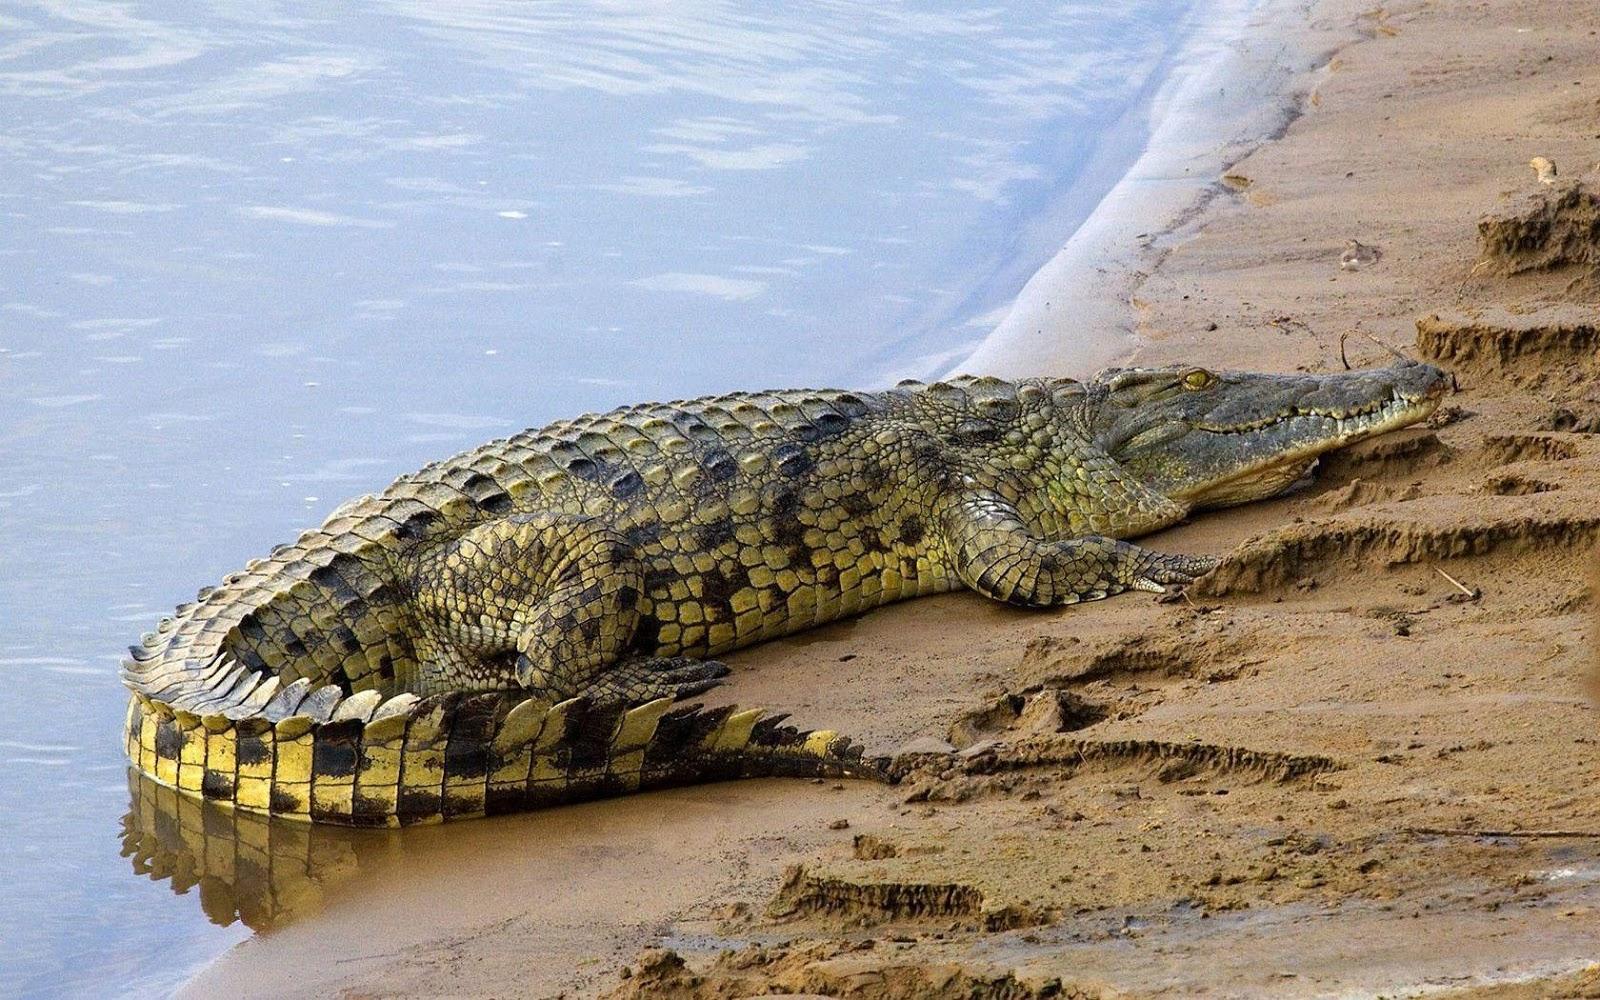 American salt water alligator wallpapers HD